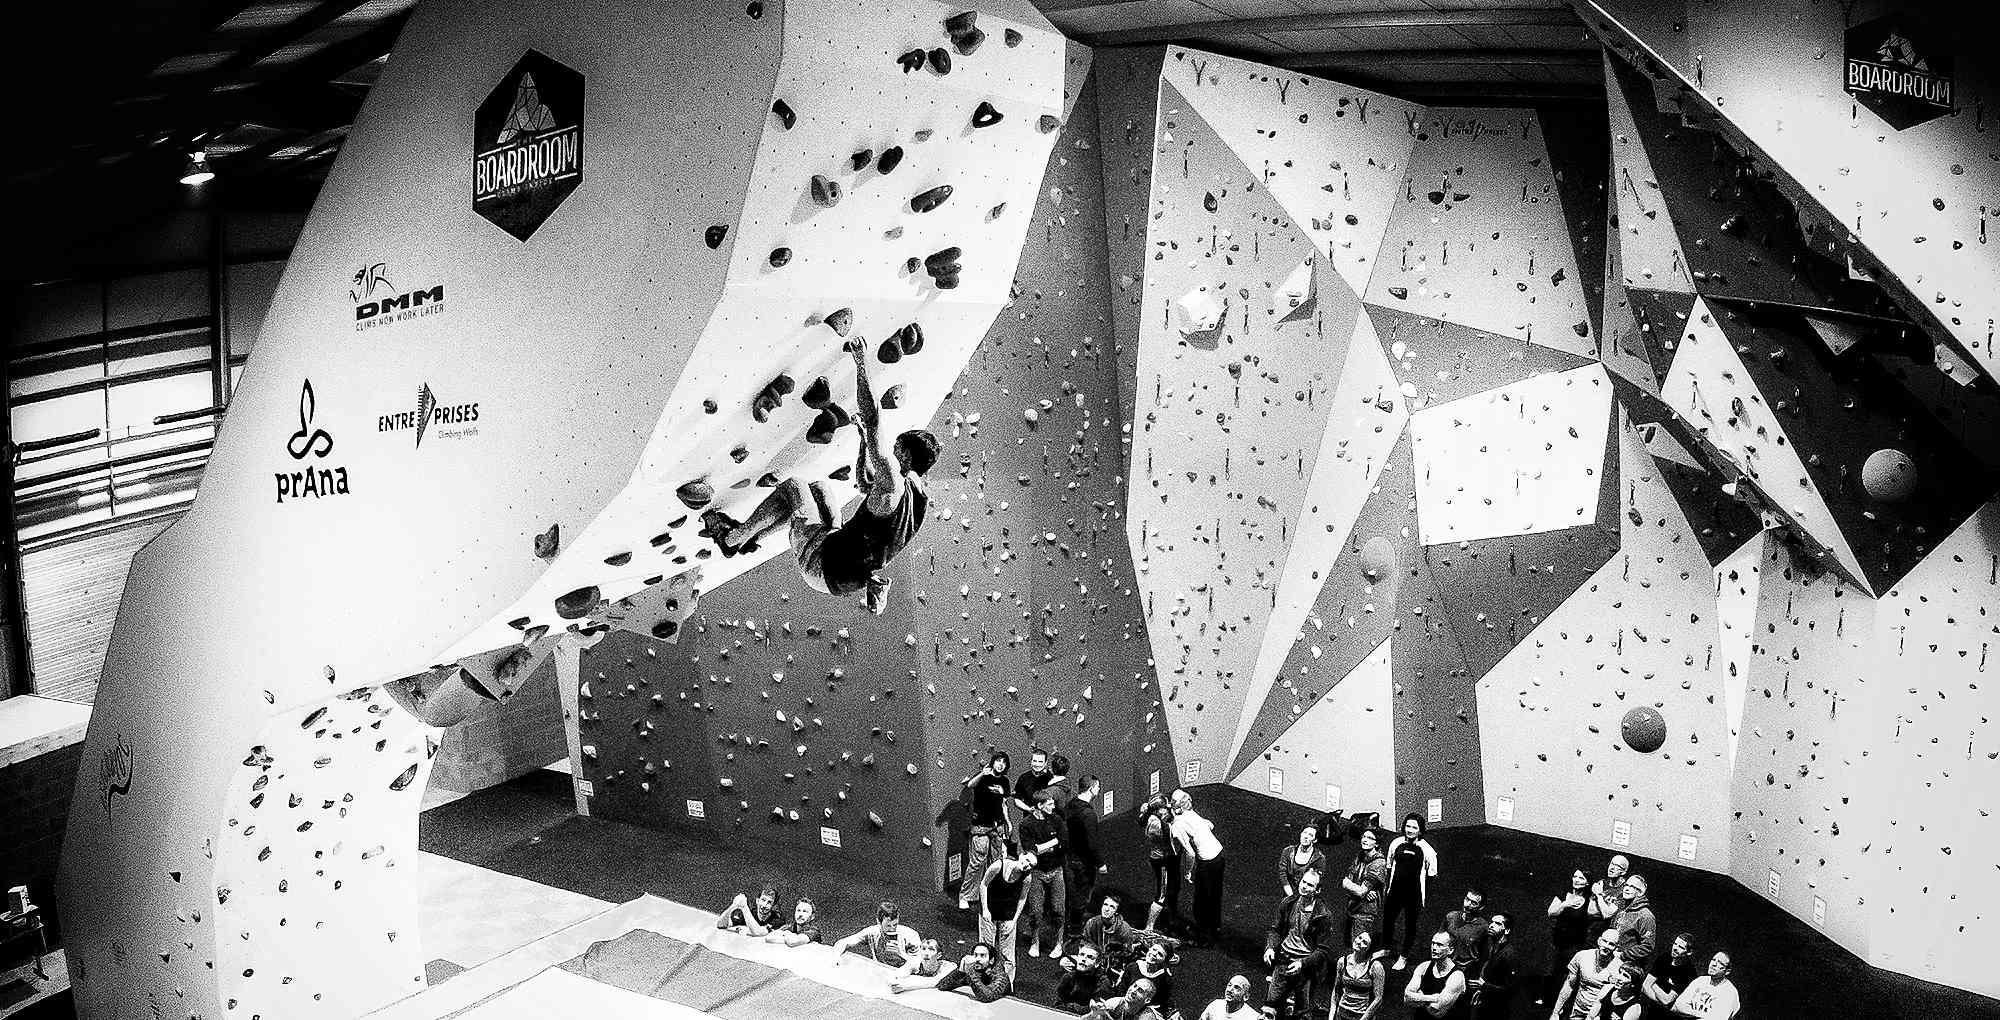 The Boardroom Climbing